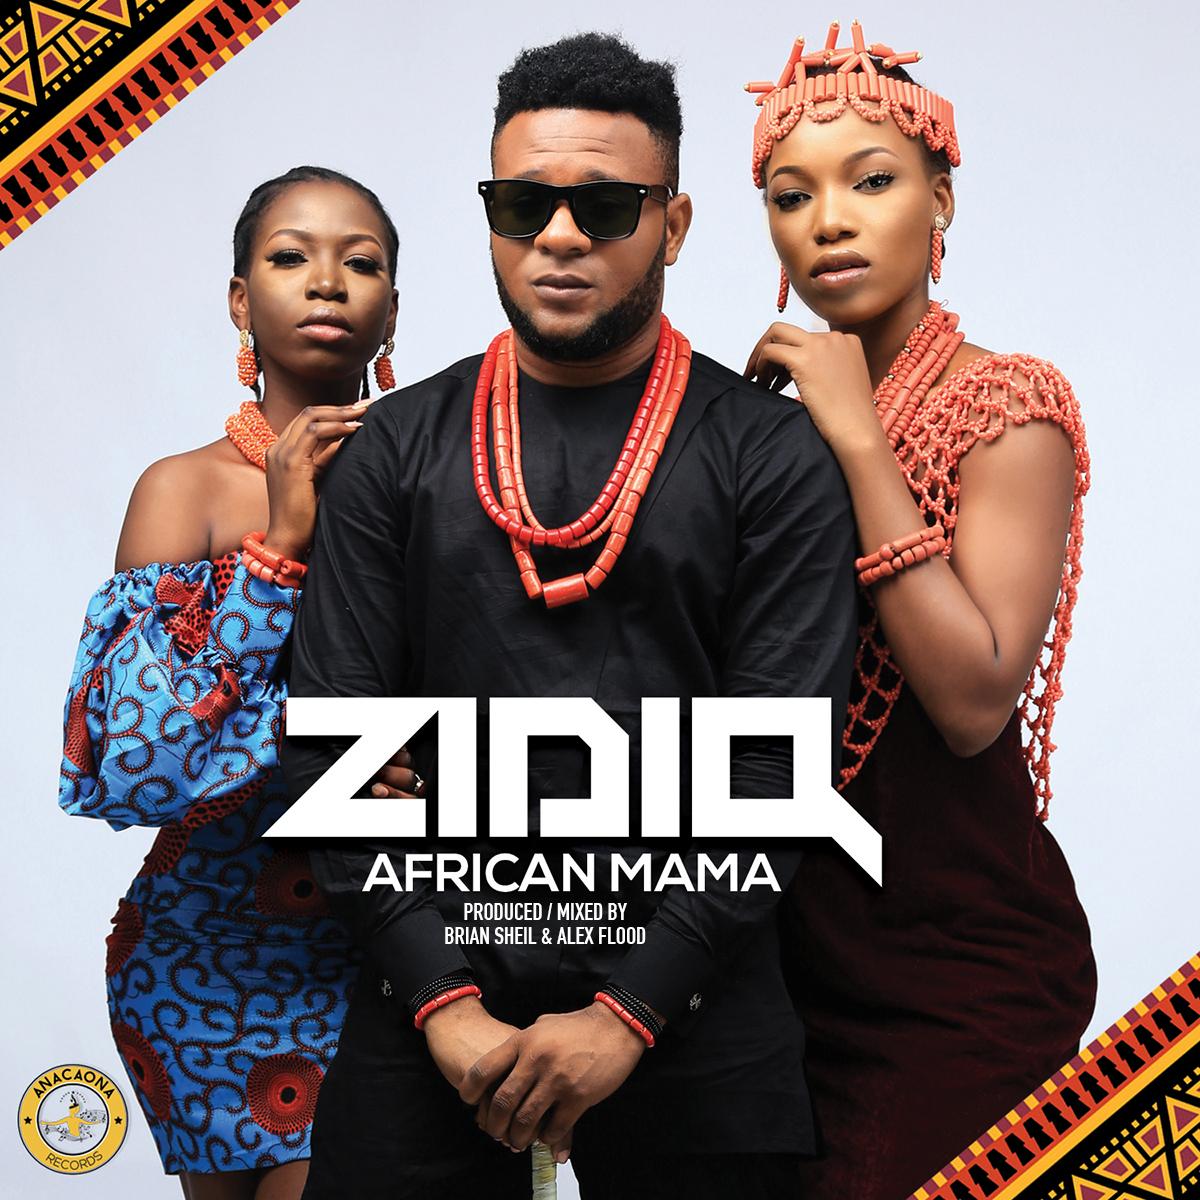 Zidiq – African Mama